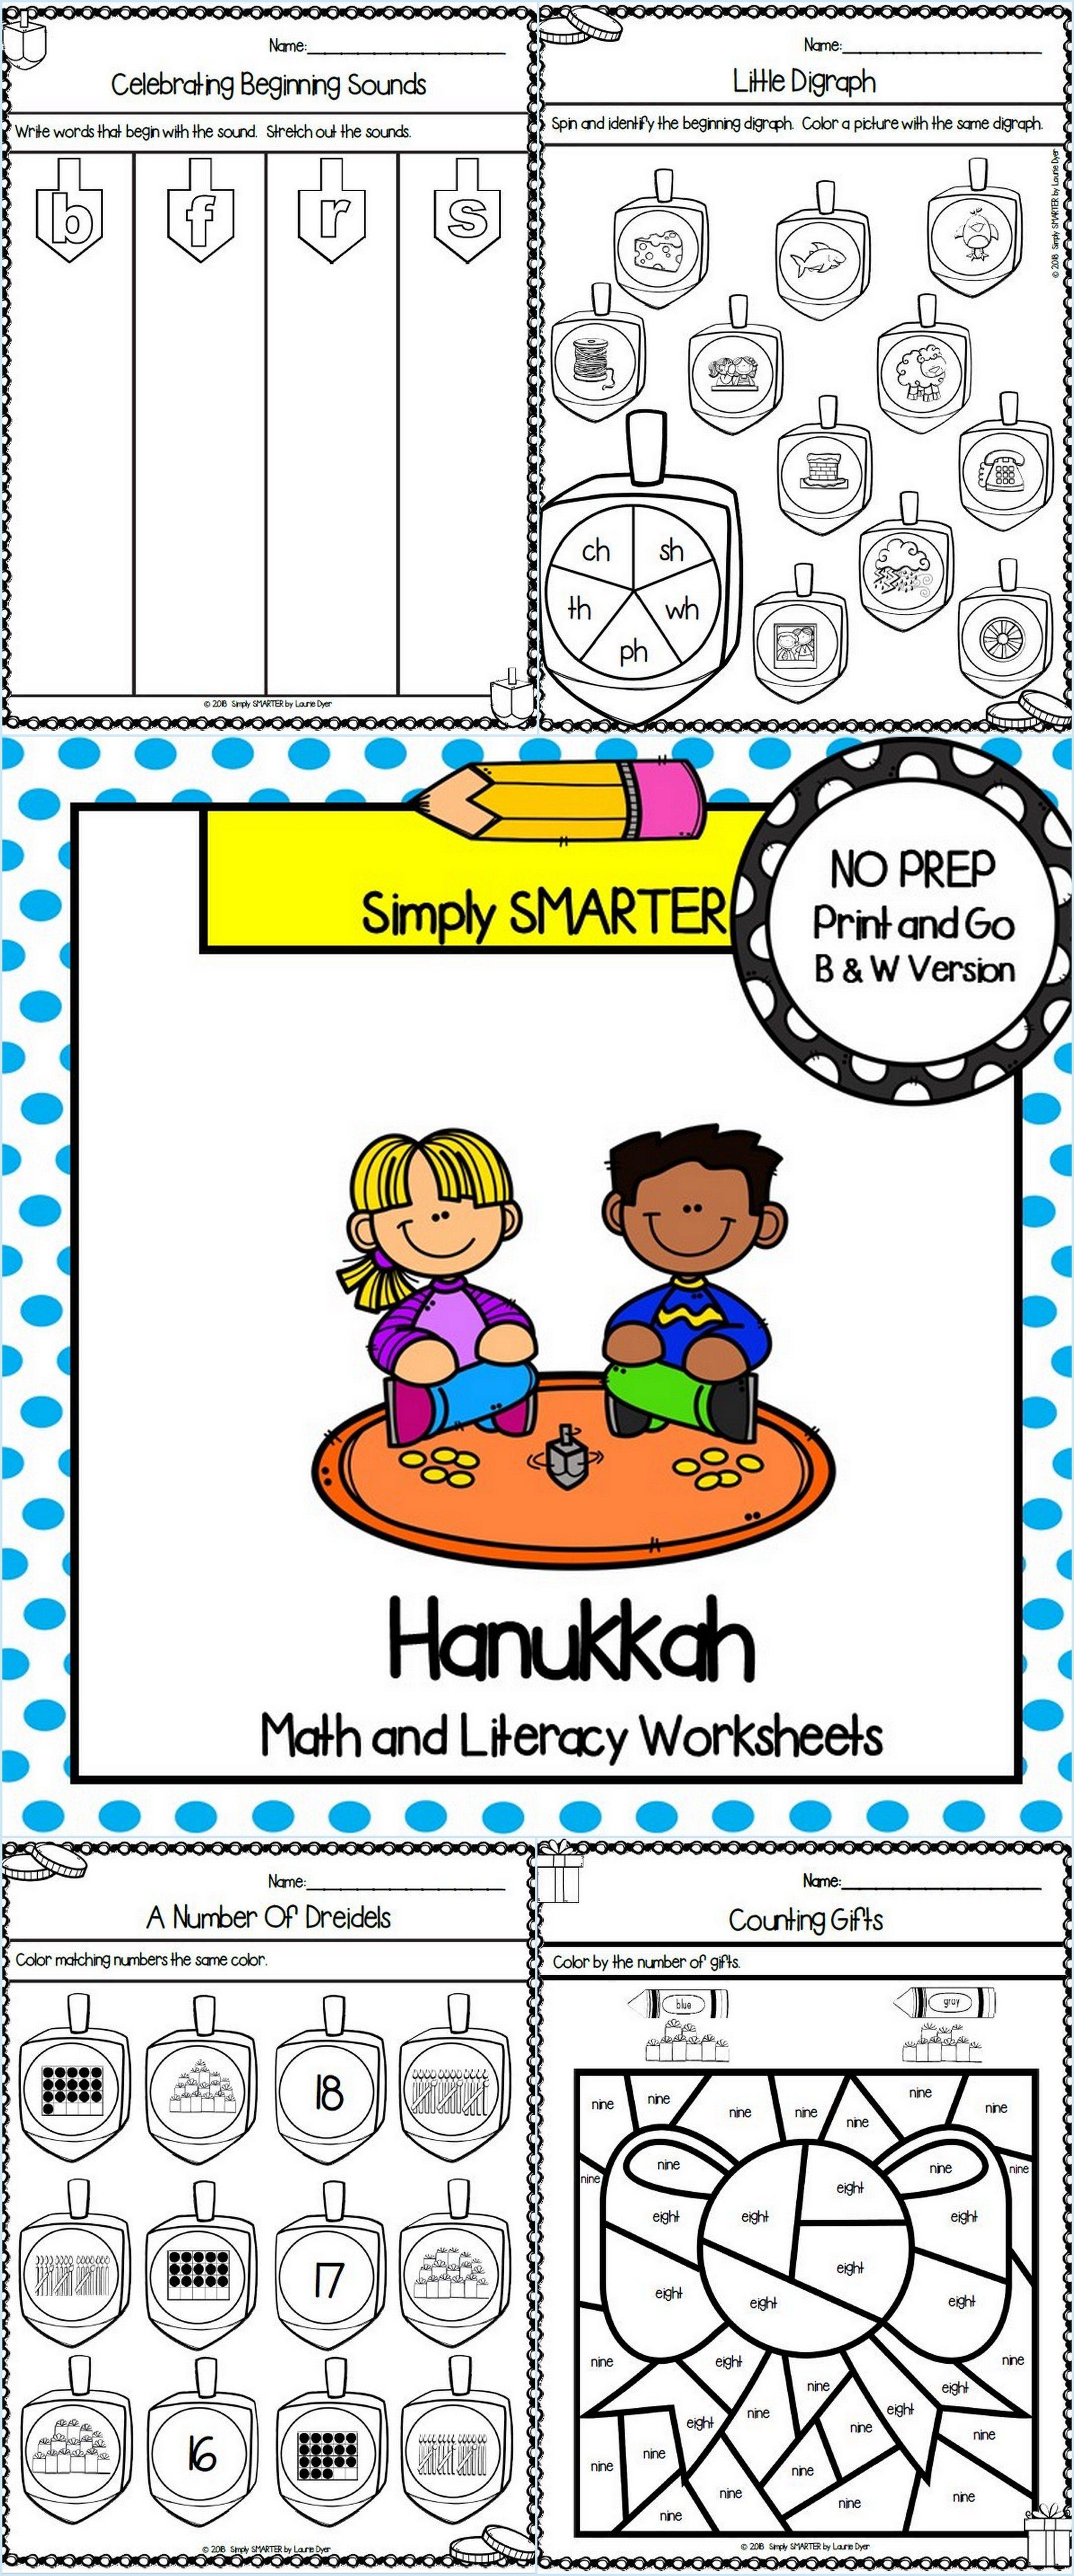 Hanukkah Themed Kindergarten Math And Literacy Worksheets